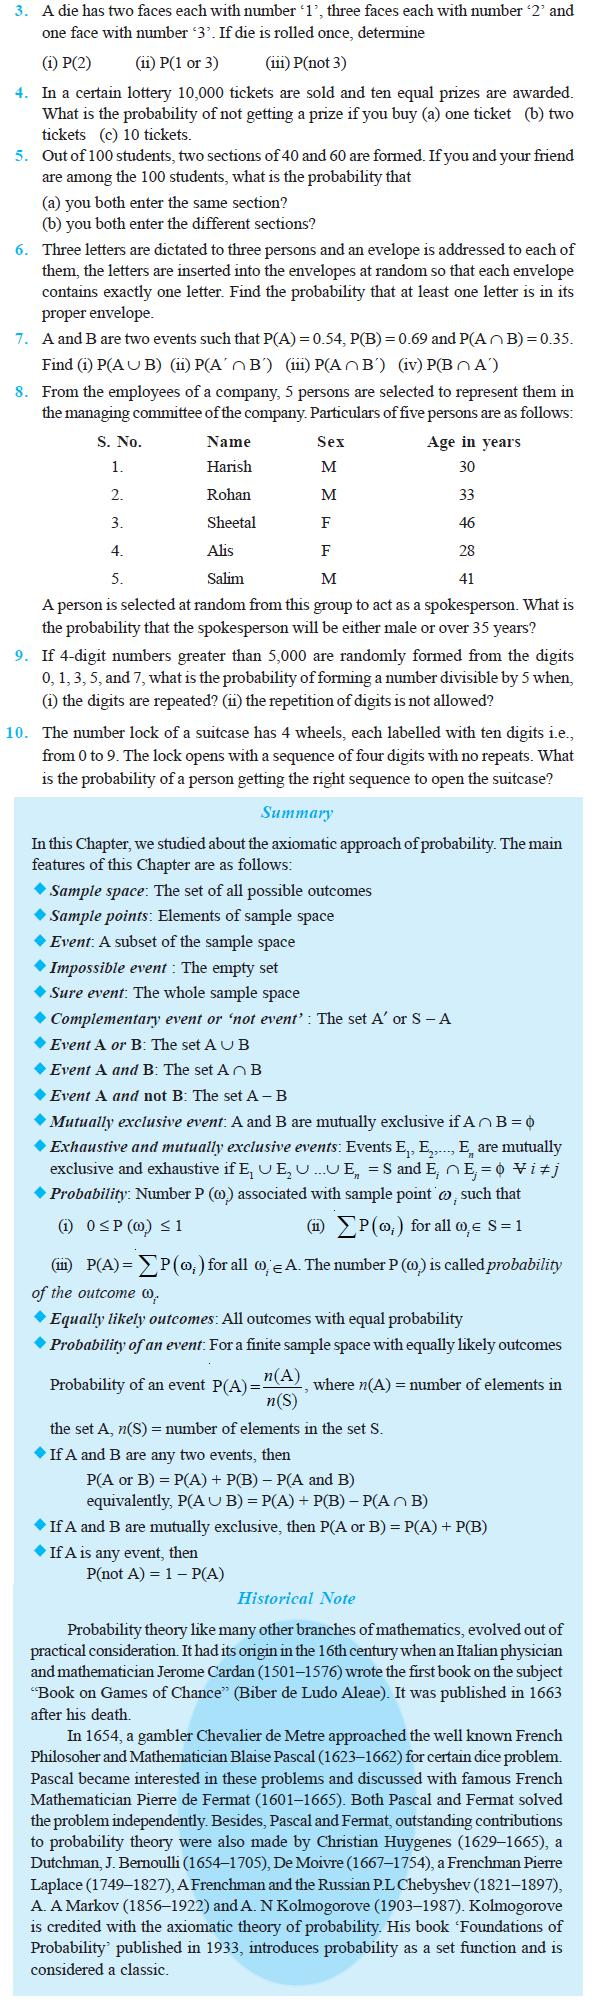 NCERT Class XI Mathematics Chapter 16 – Probability